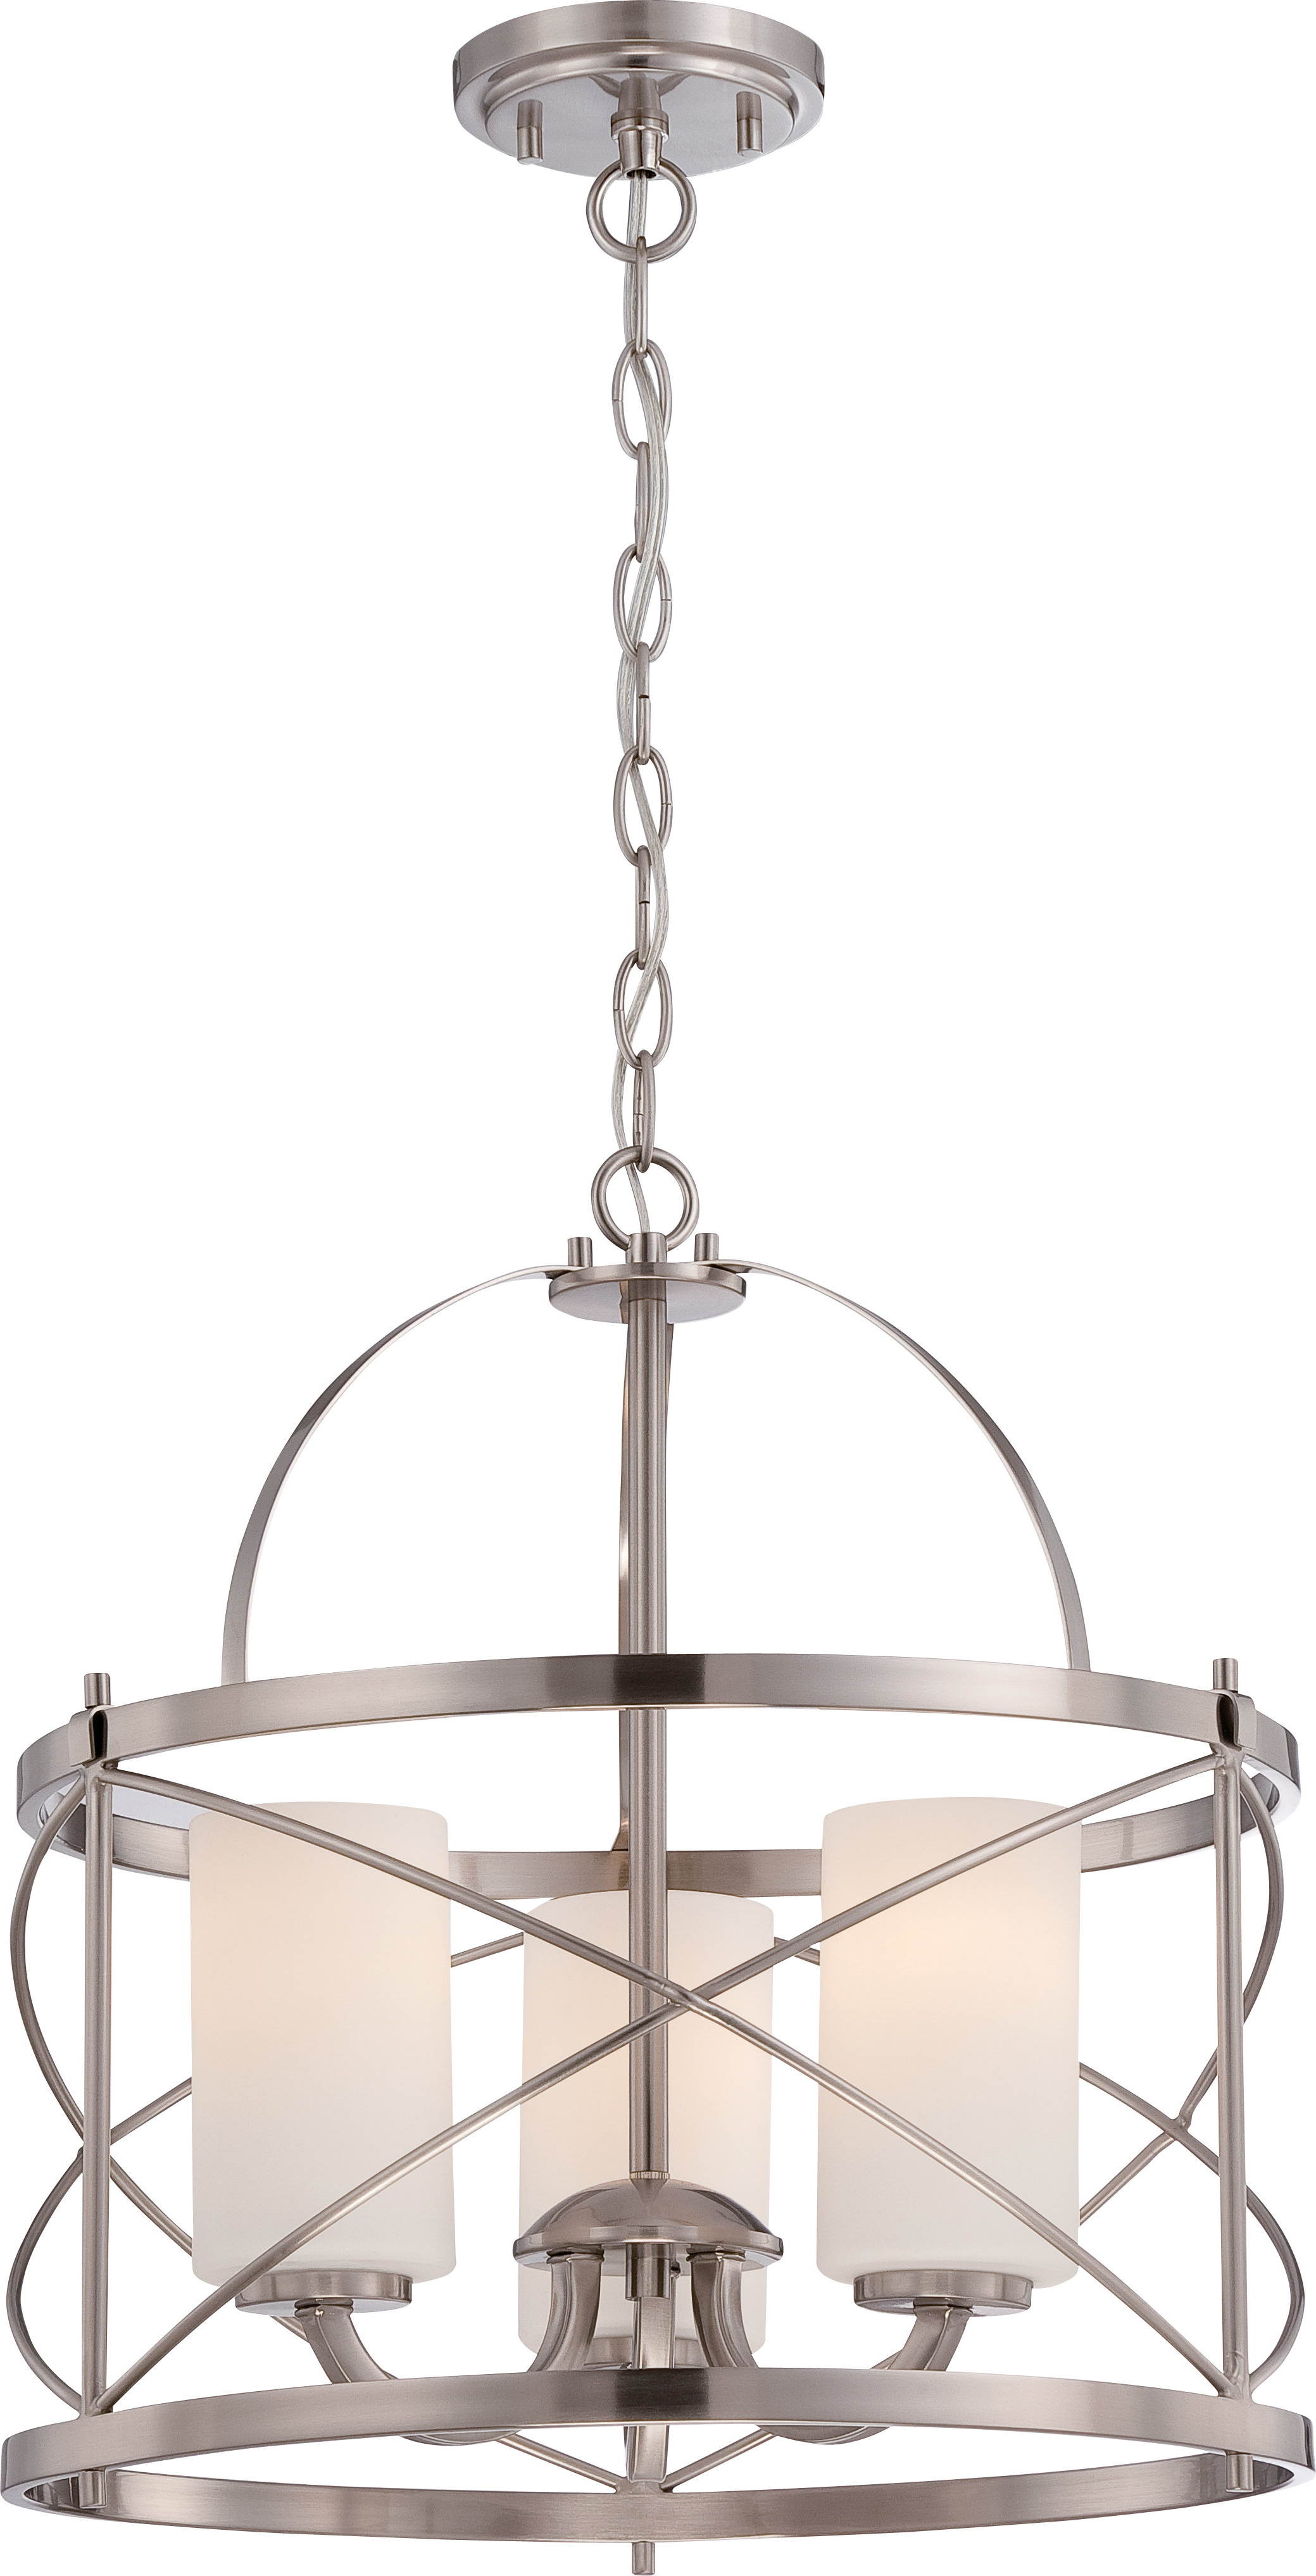 Best And Newest Farrier 3 Light Lantern Drum Pendant For Armande 3 Light Lantern Geometric Pendants (View 8 of 20)